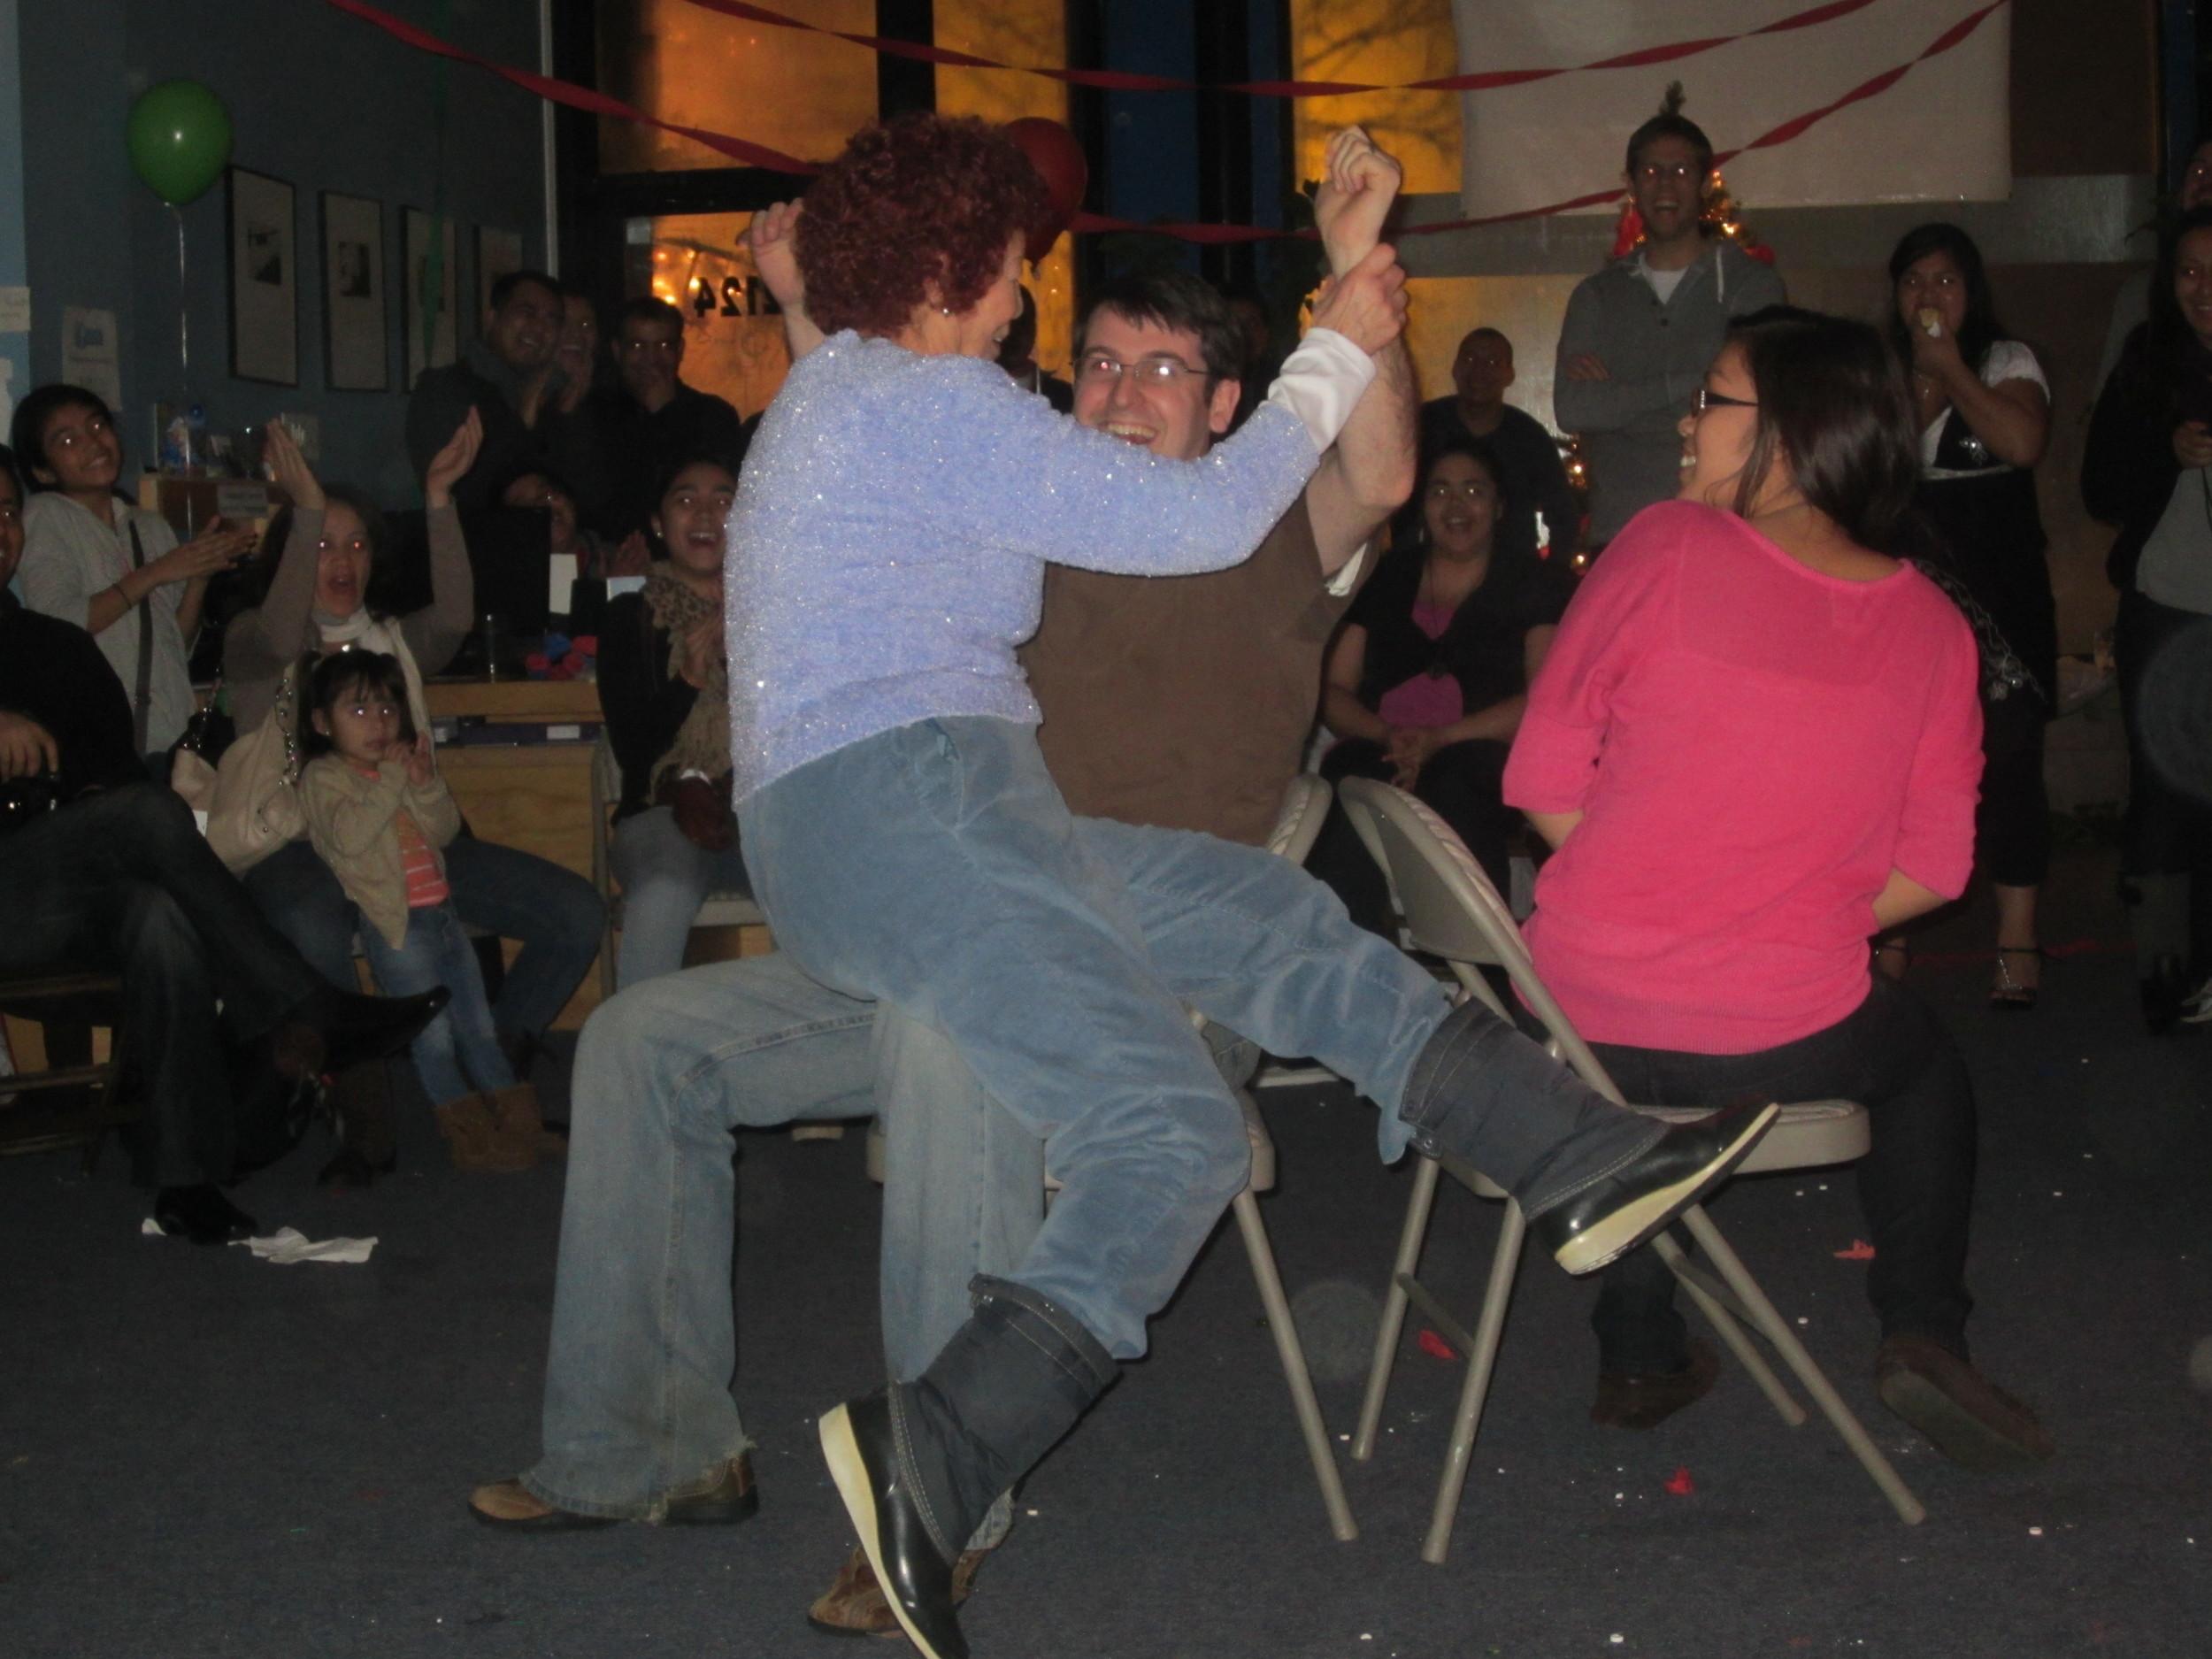 la_posada_joel_ana_maria_musical_chairs